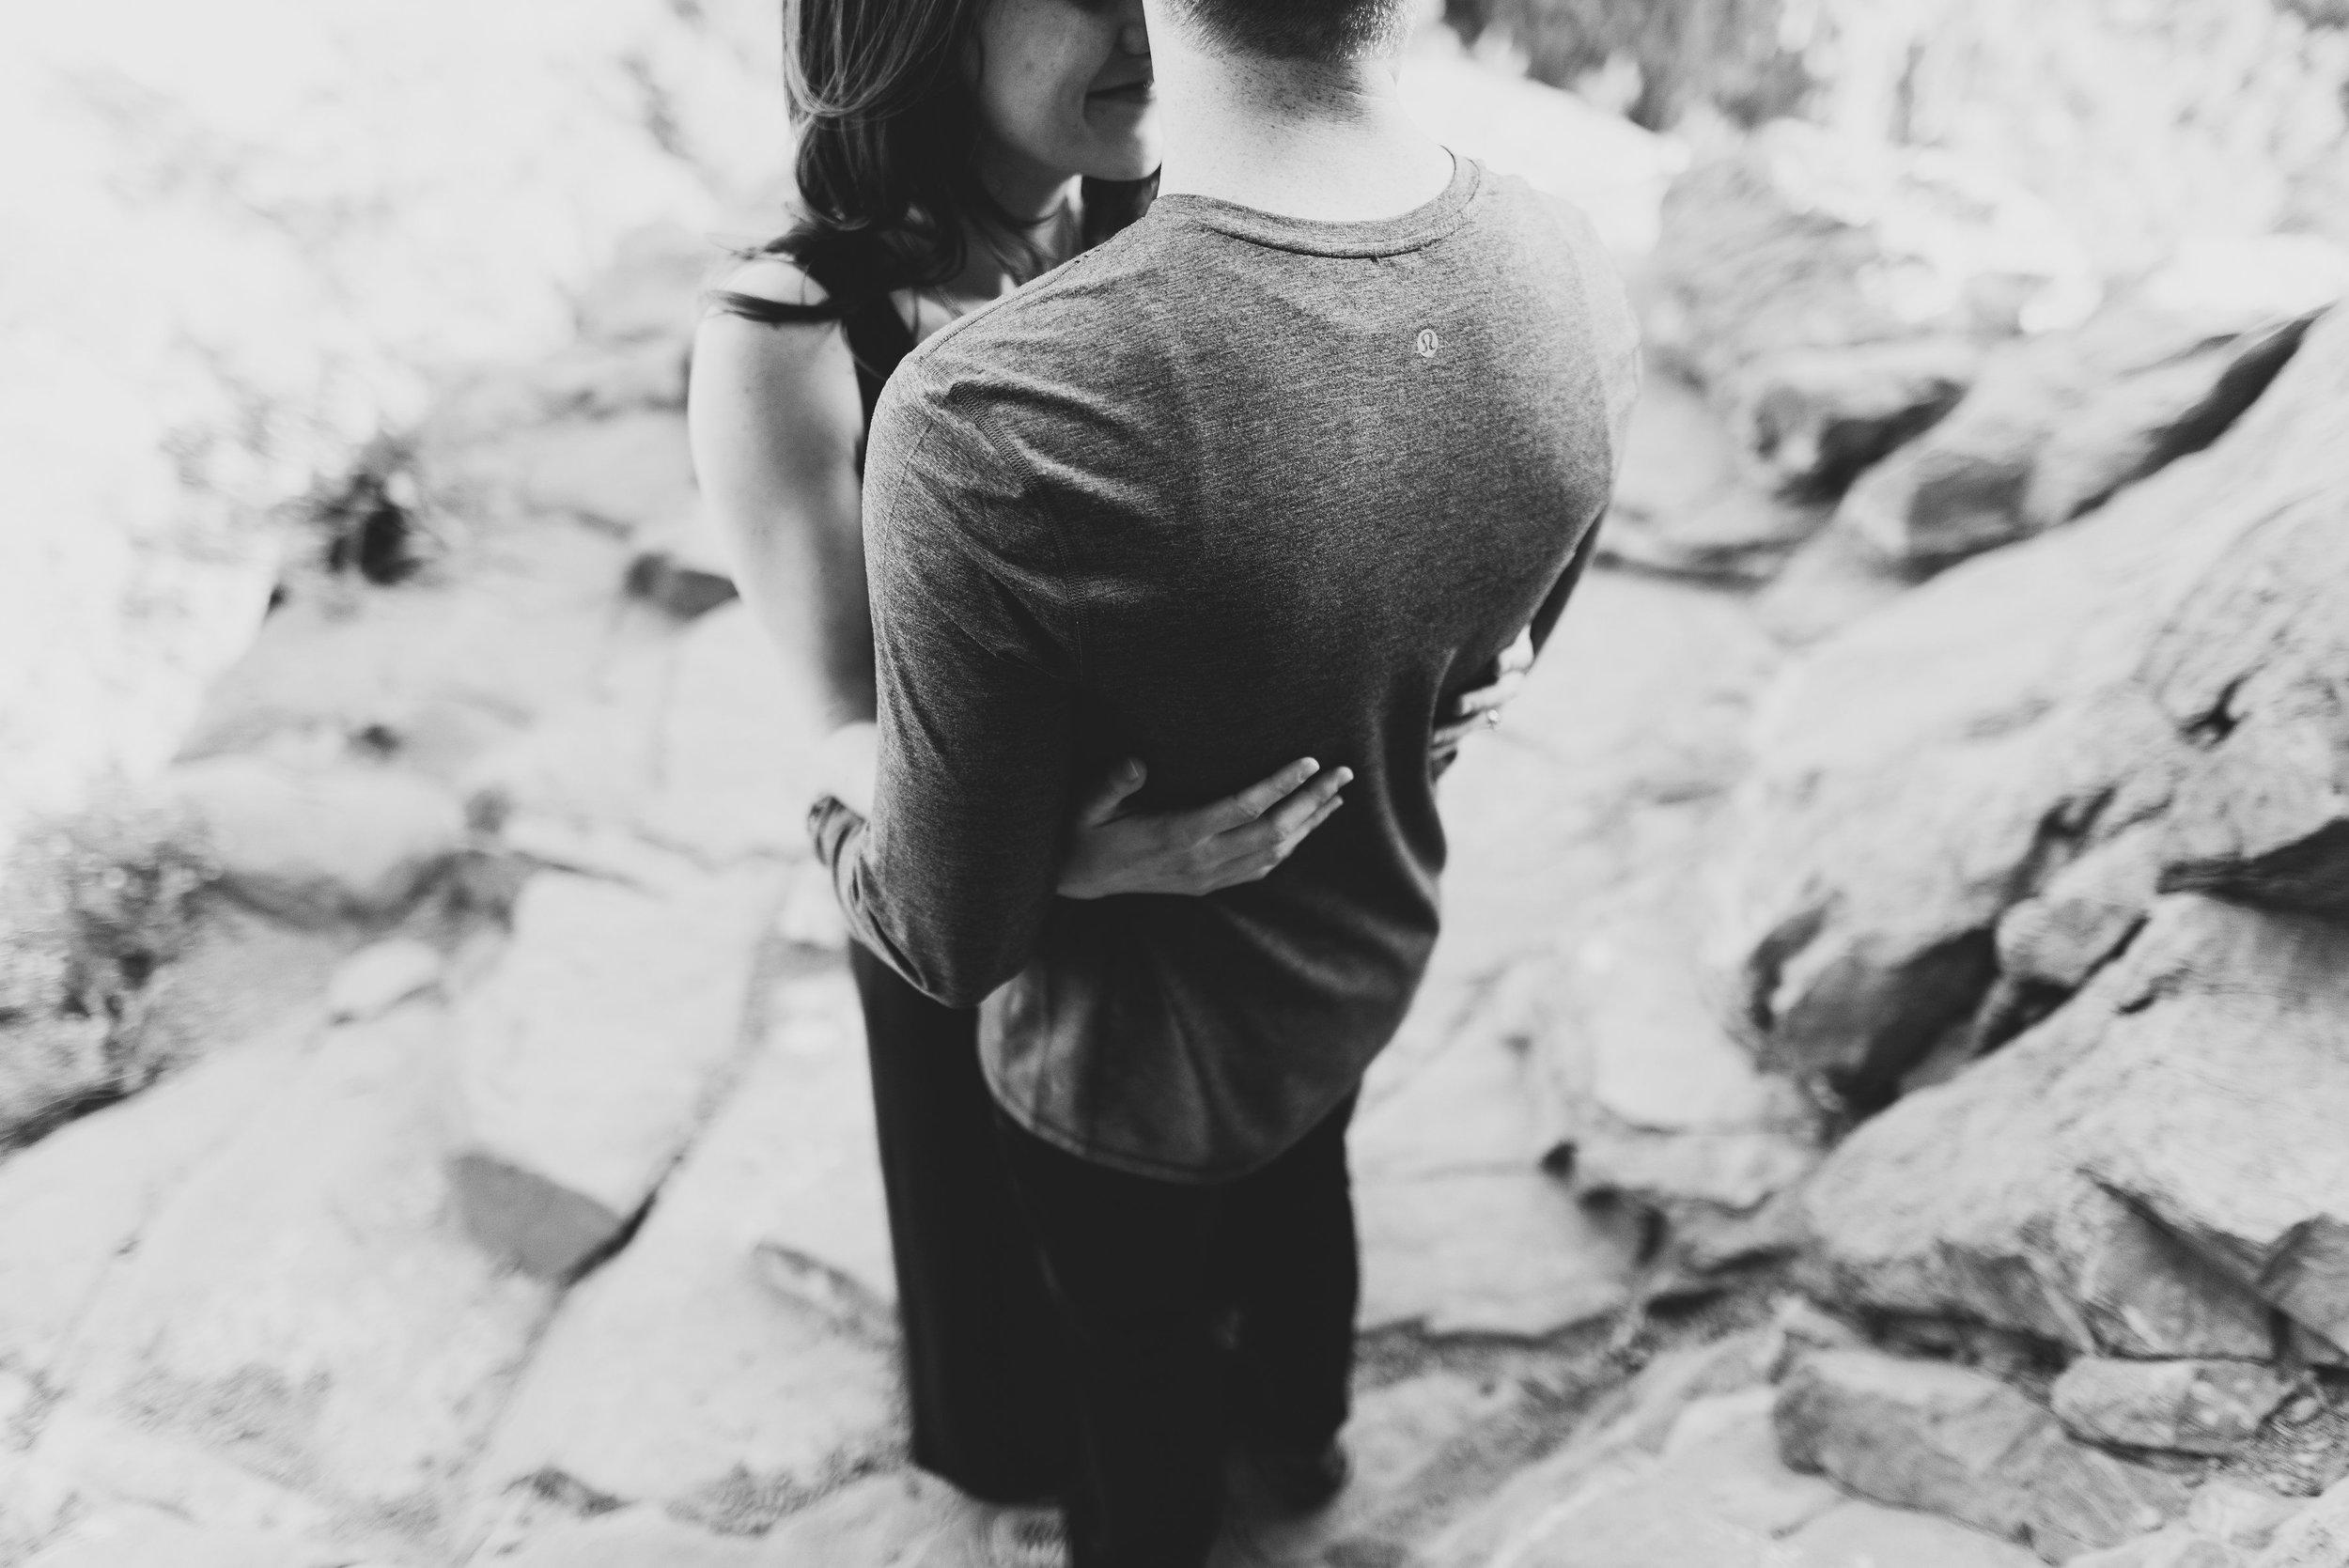 Isaiah-&-Taylor-Photography---Paul-&-Karen-Engagement,-Sedona-Arizona-102.jpg